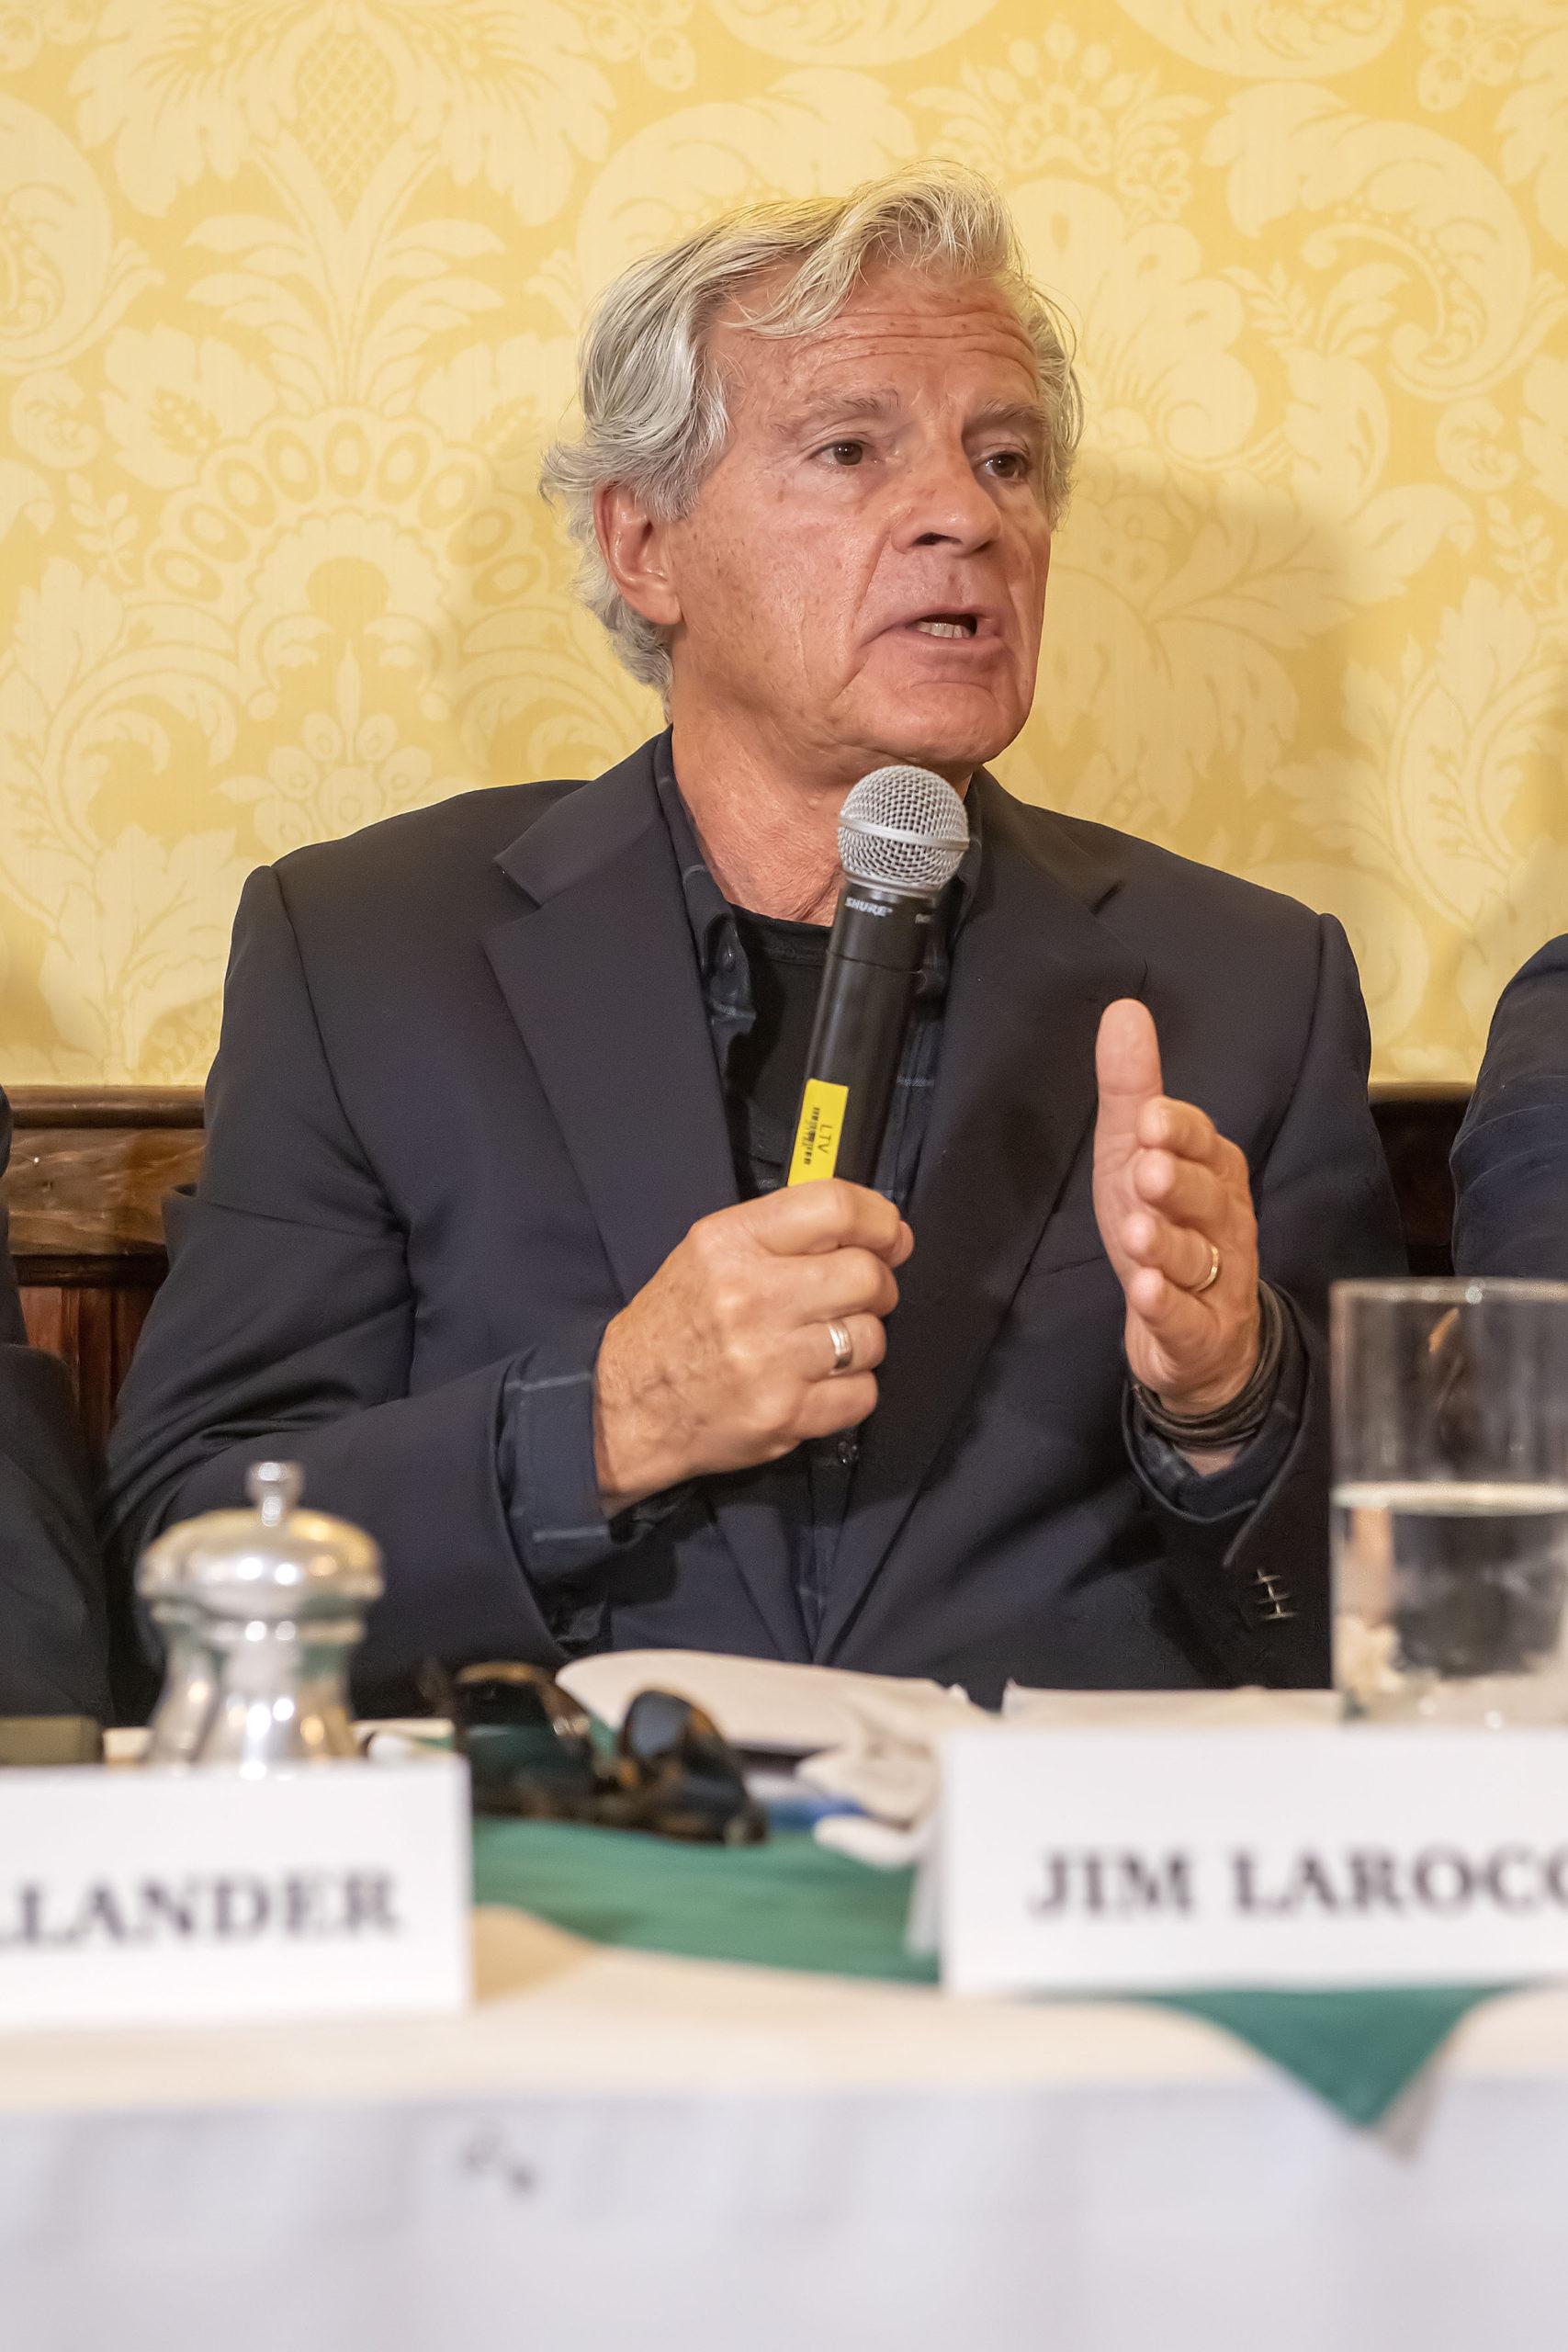 Trustee James Larocca